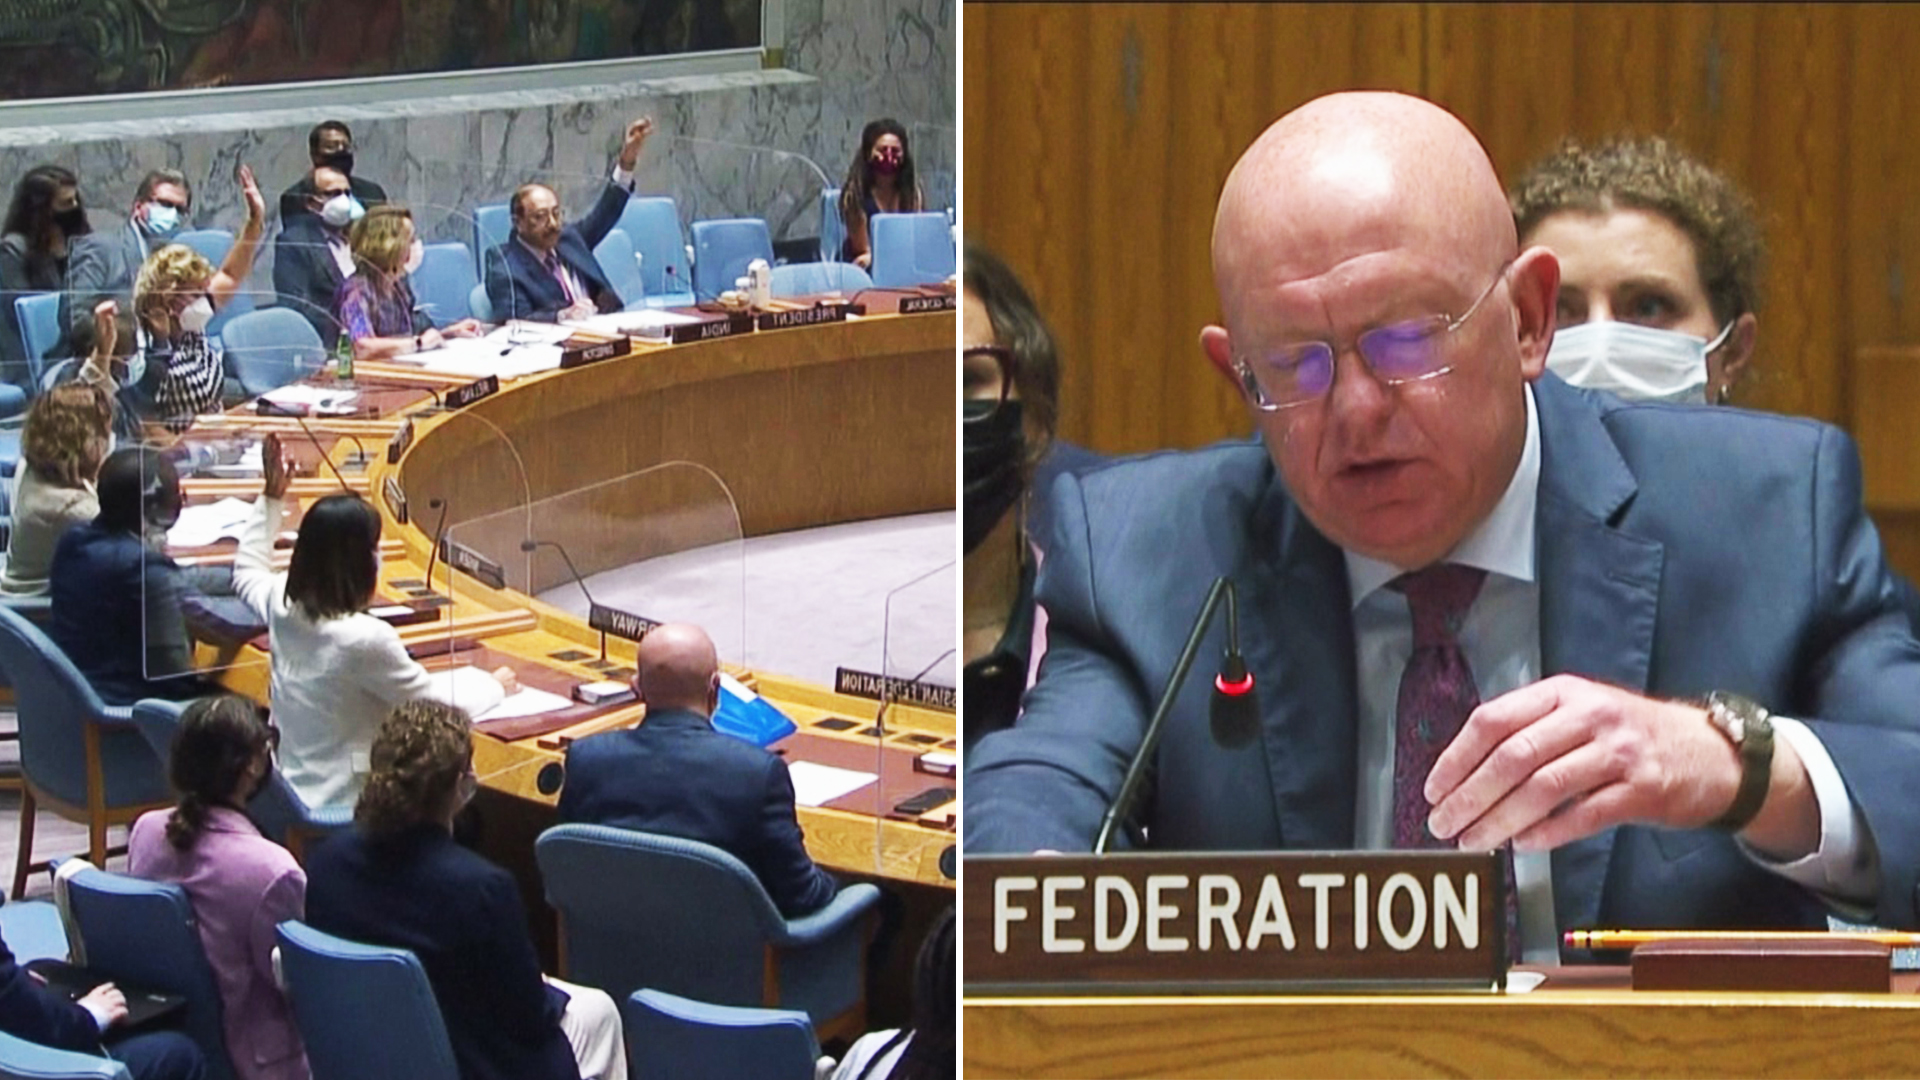 Совет Безопасности ООН принял резолюцию по Афганистану